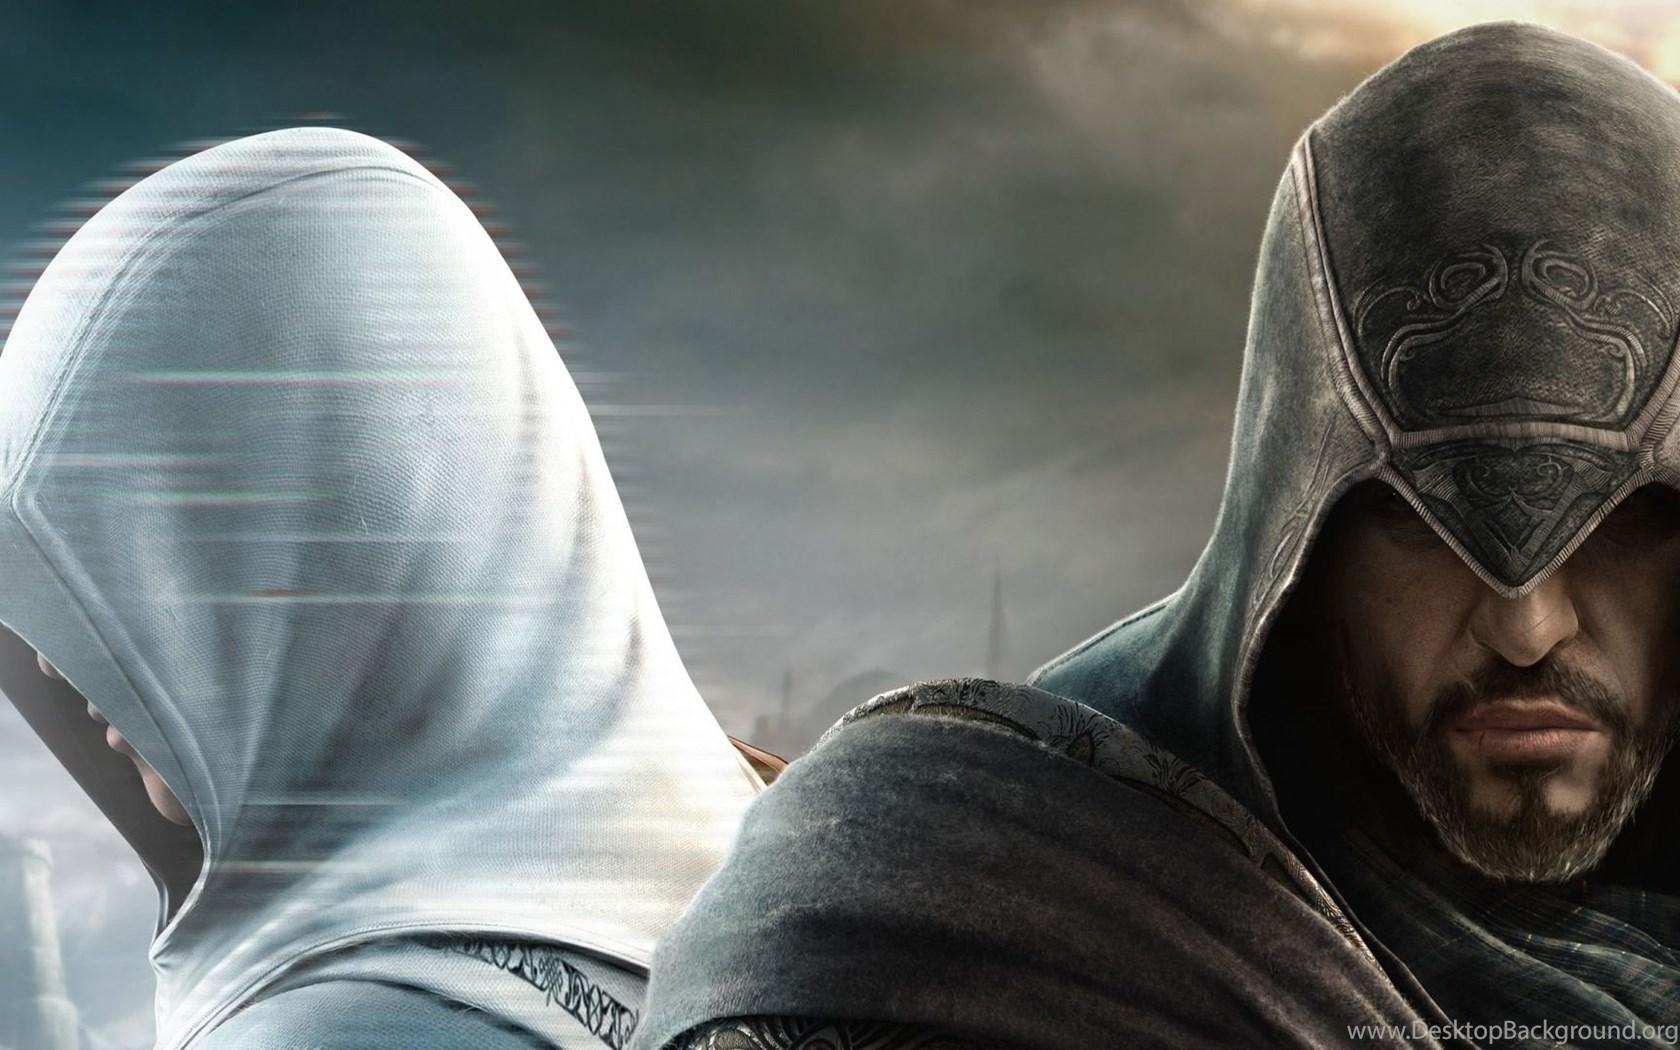 Assassins Creed Dual Screen Wallpapers Desktop Background